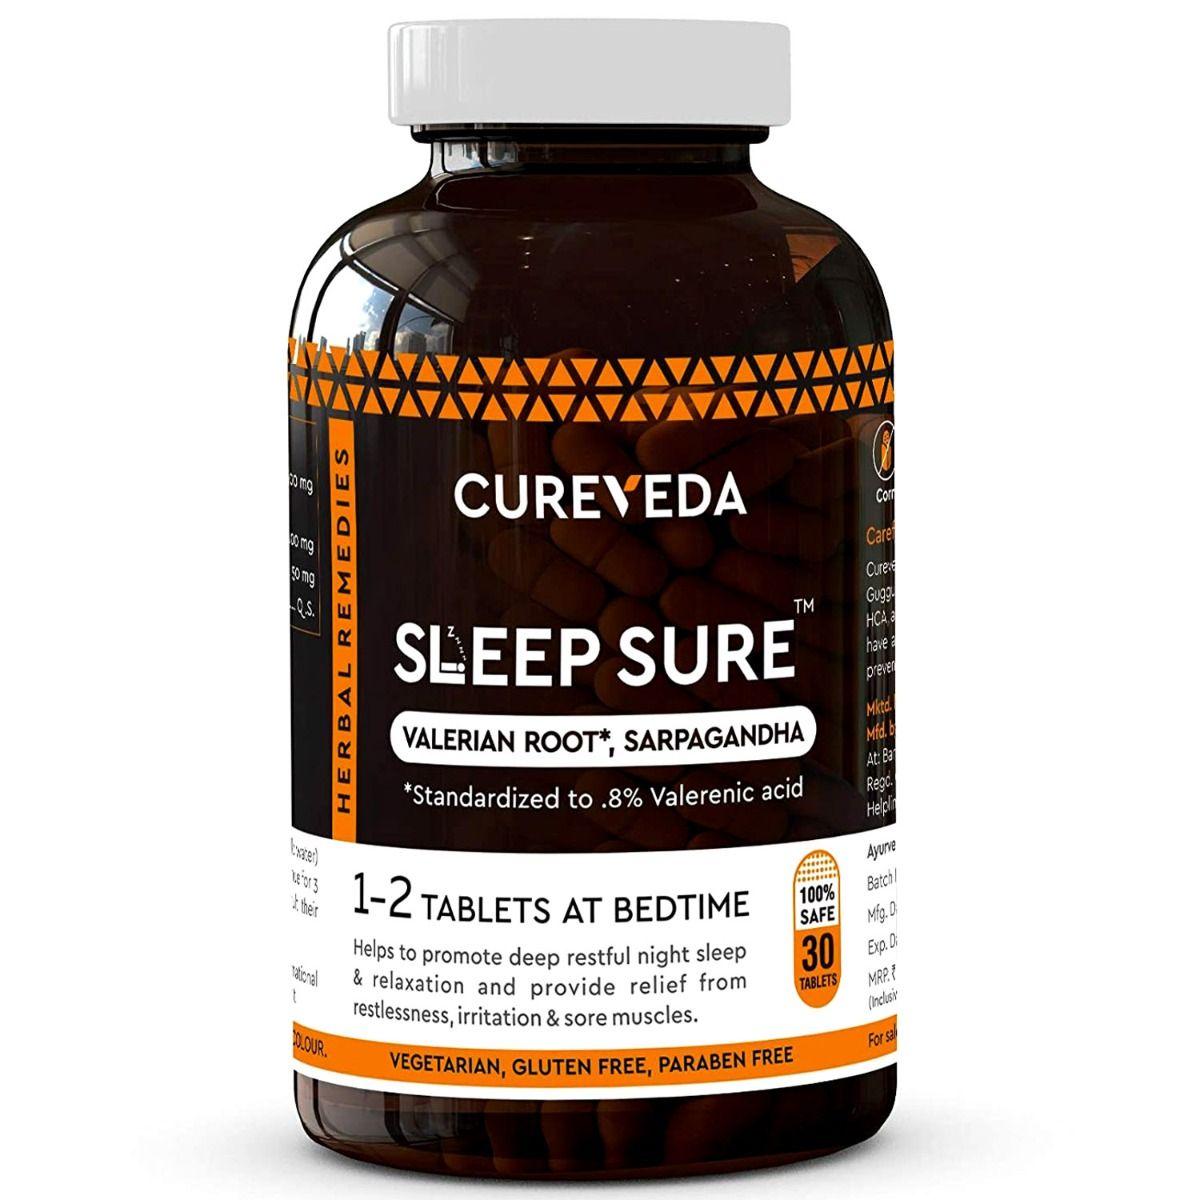 Cureveda Sleep Sure, 30 Tablets